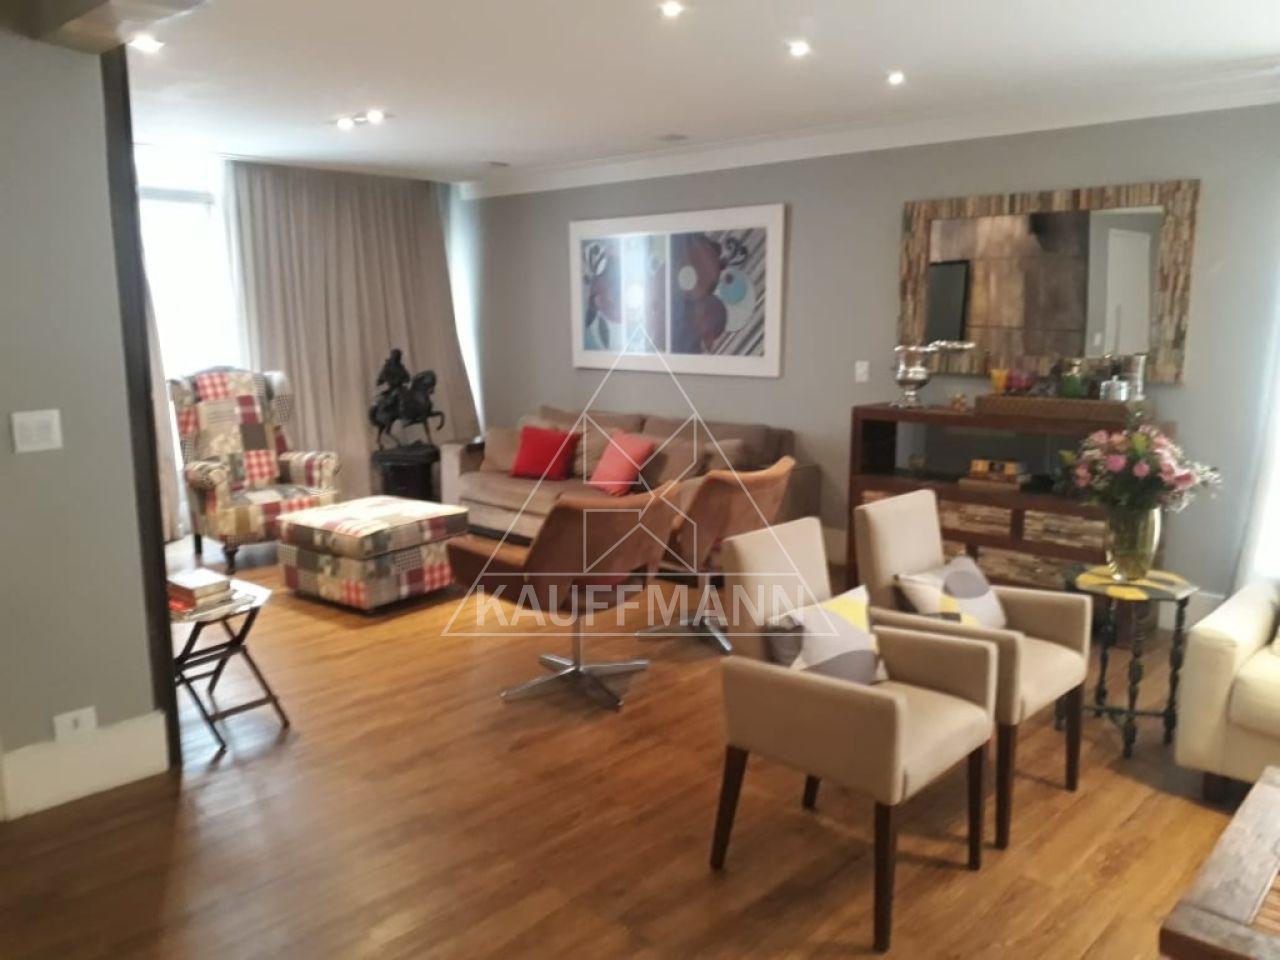 apartamento-venda-sao-paulo-jardim-paulista-3dormitorios-3suites-1vaga-174m2-Foto2